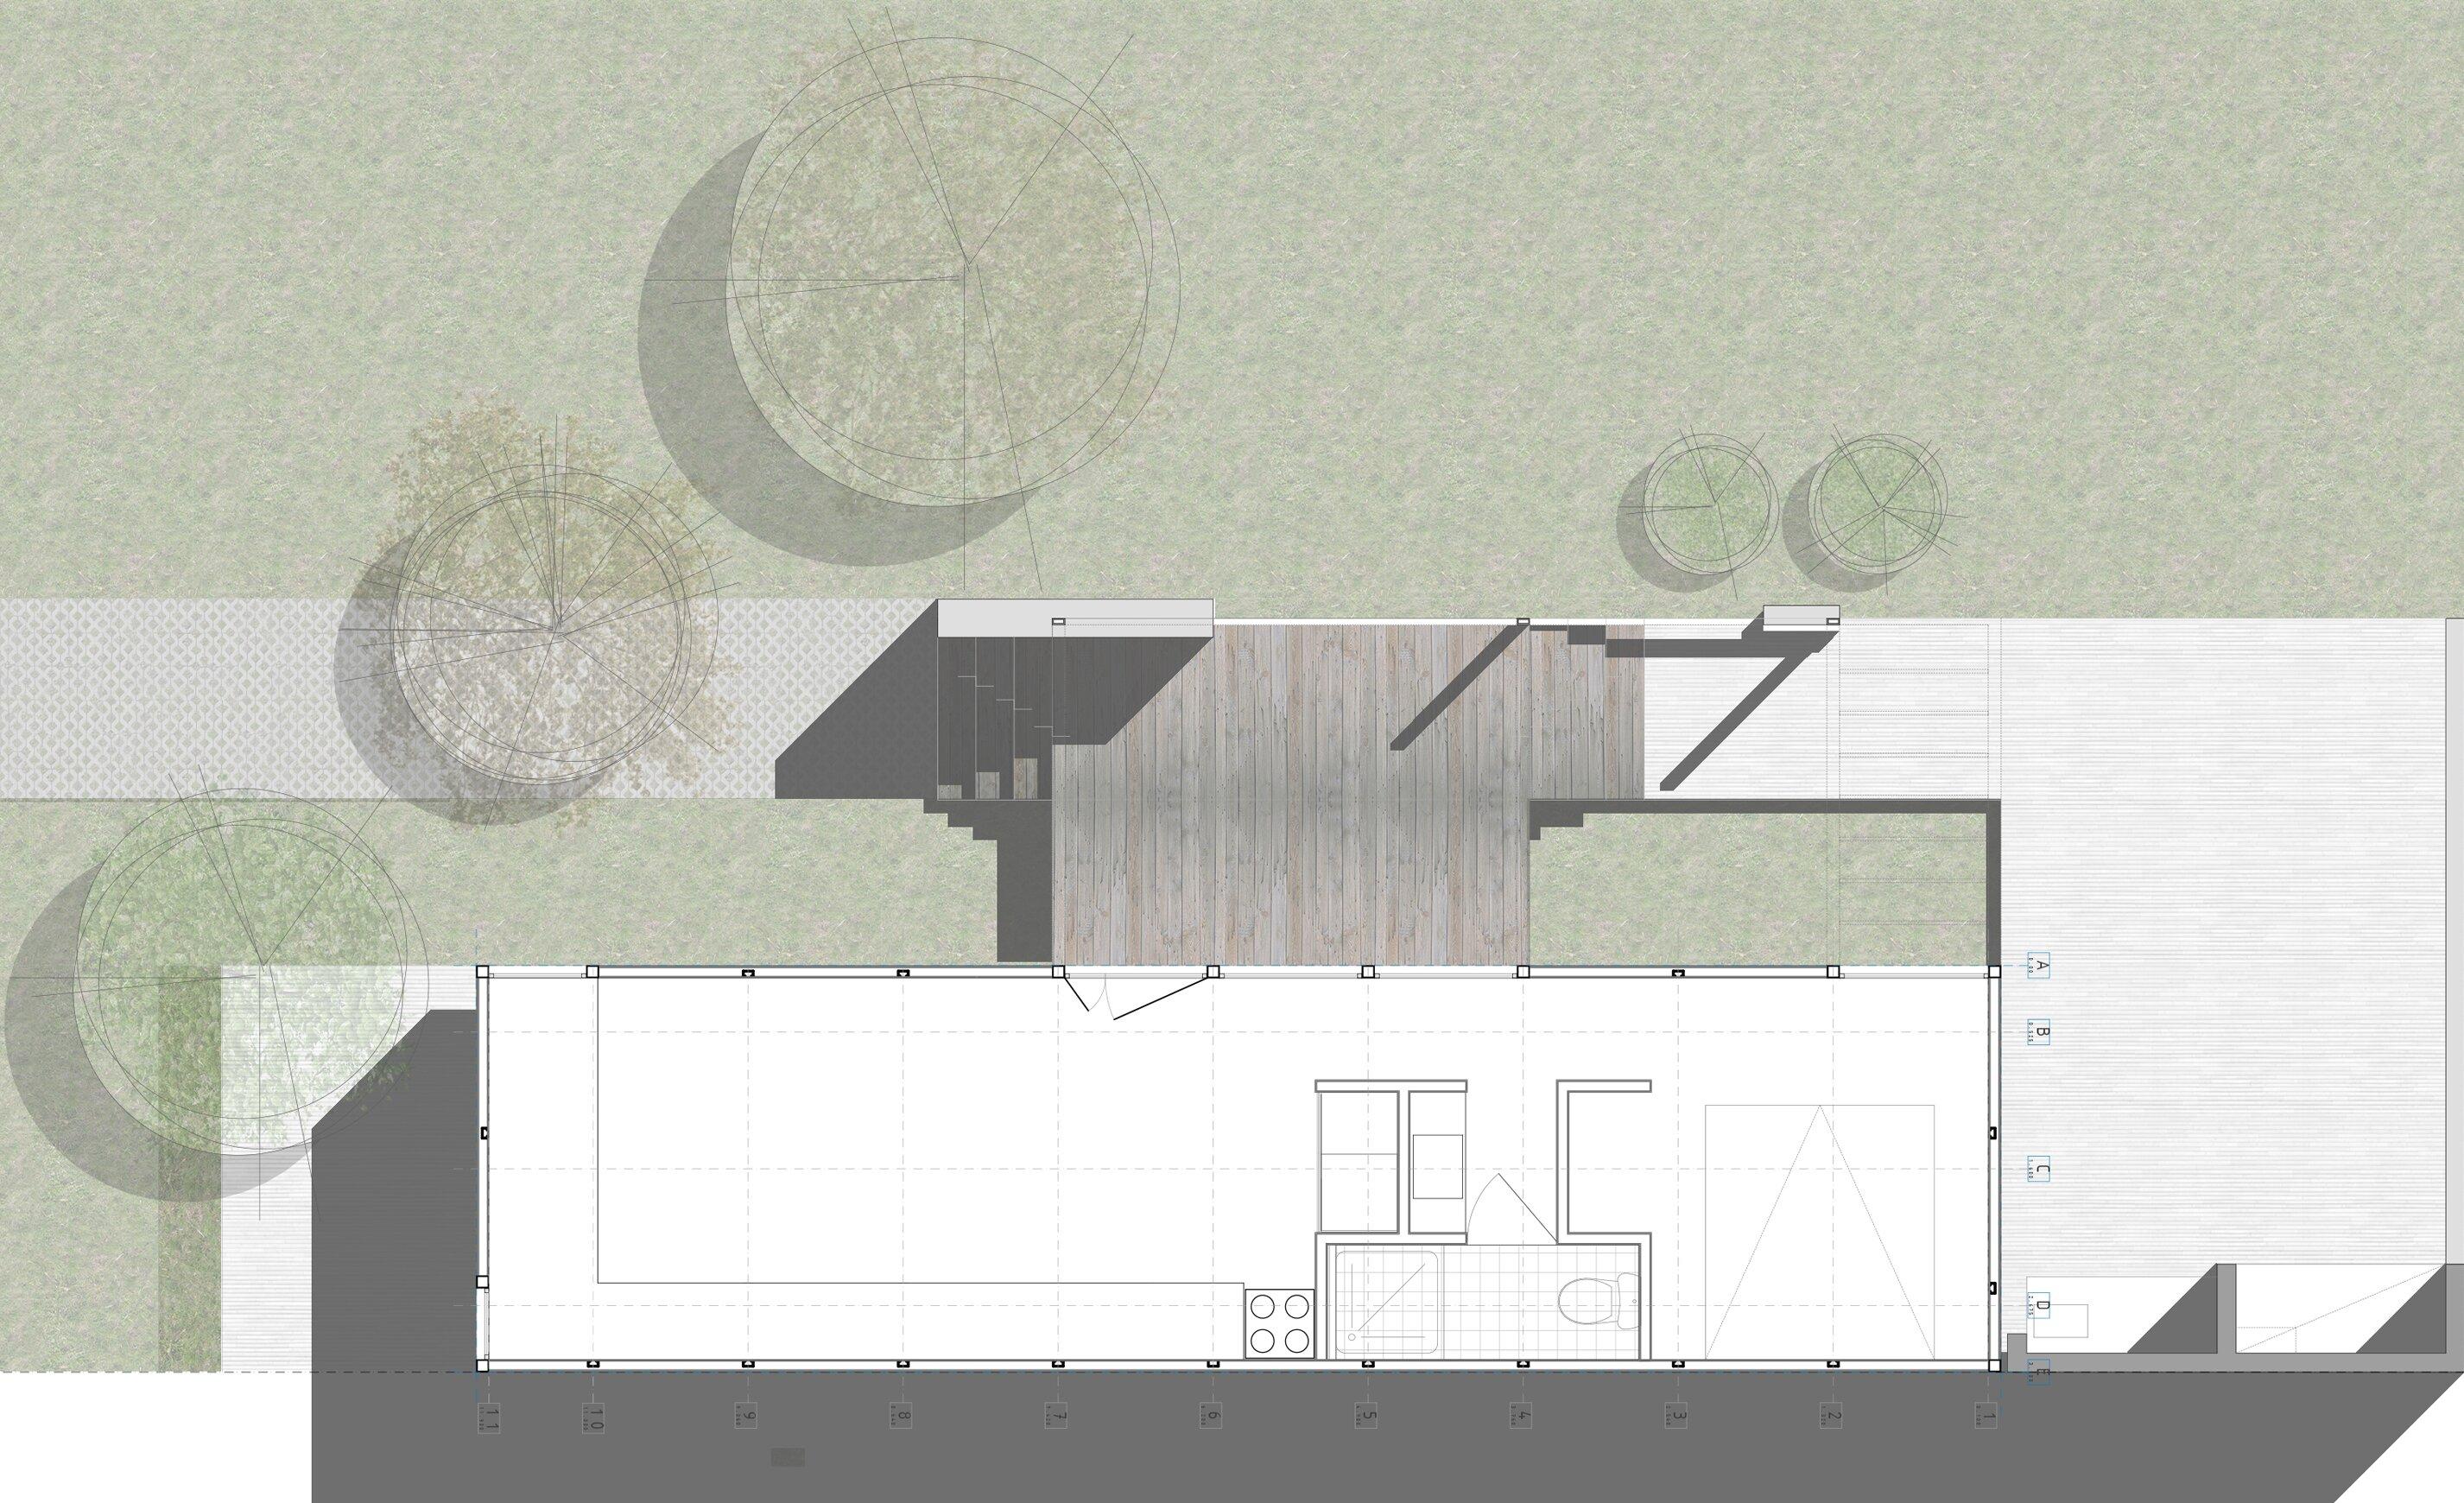 Mía House - Matias Pons Estel - Argentina - Small House - Floor Plan - Humble Homes